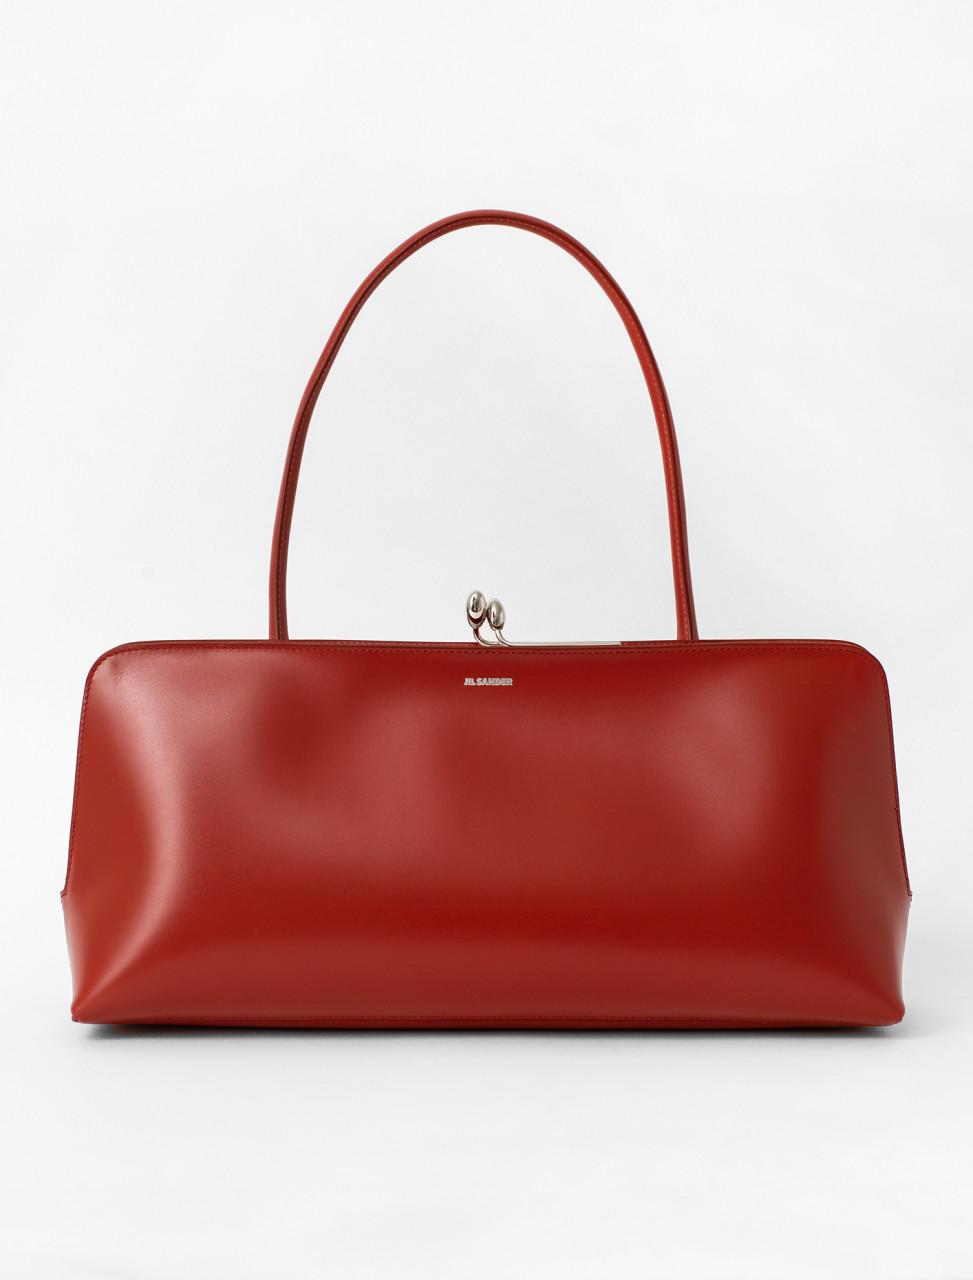 Calfskin Frame Bag in Dark Red